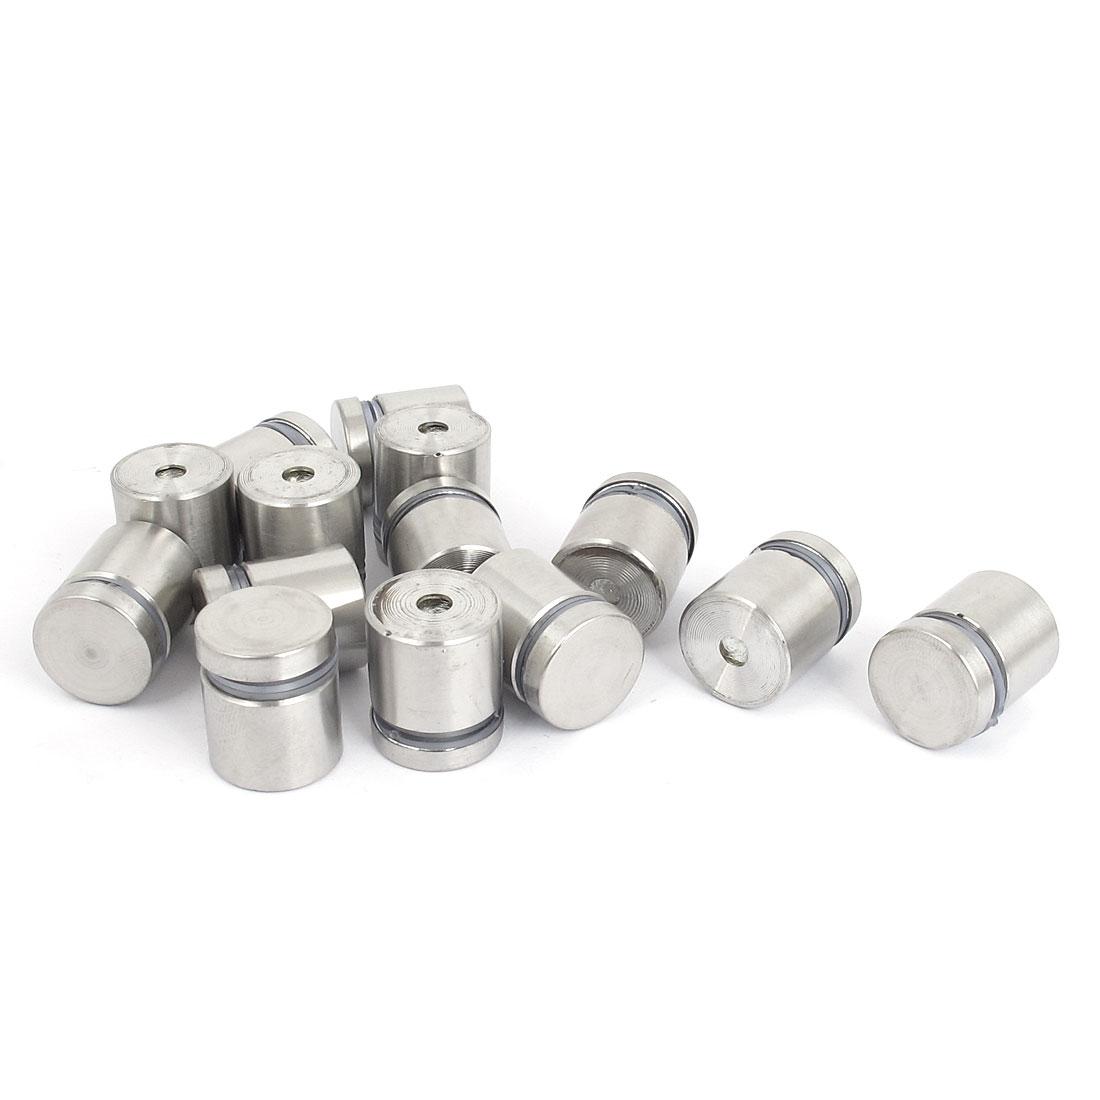 19mm x 20mm Stainless Steel Advertising Frameless Glass Standoff Pins 14pcs